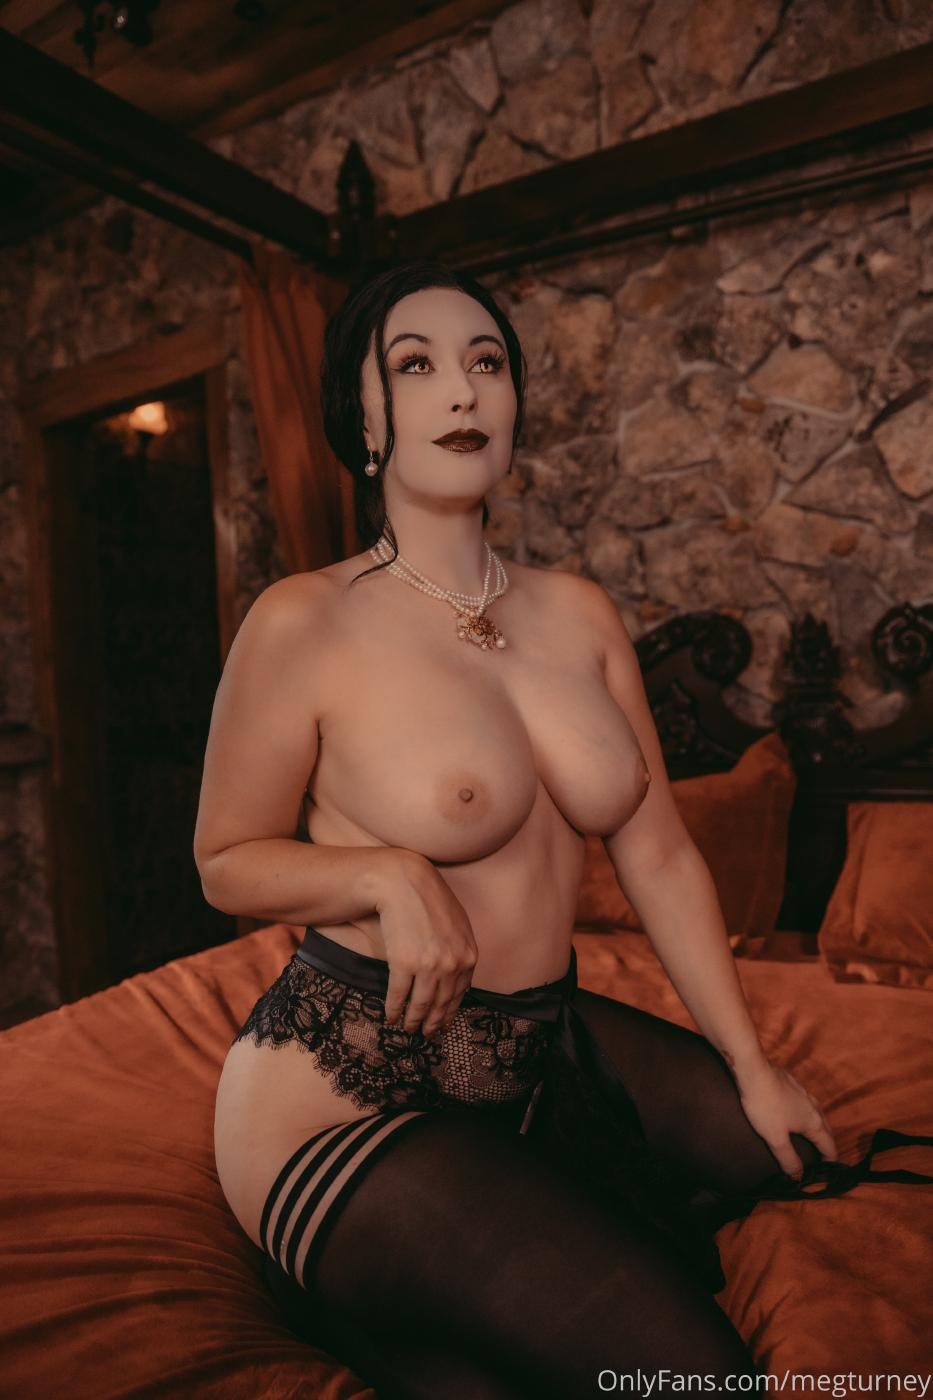 Meg Turney Lady Dimitrescu Cosplay Onlyfans Set Leaked 0005